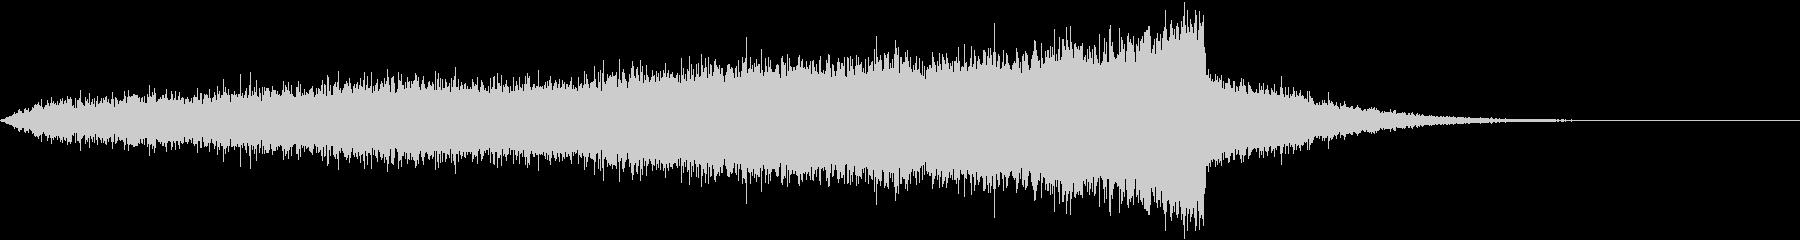 CINEMATIC RISER_10の未再生の波形